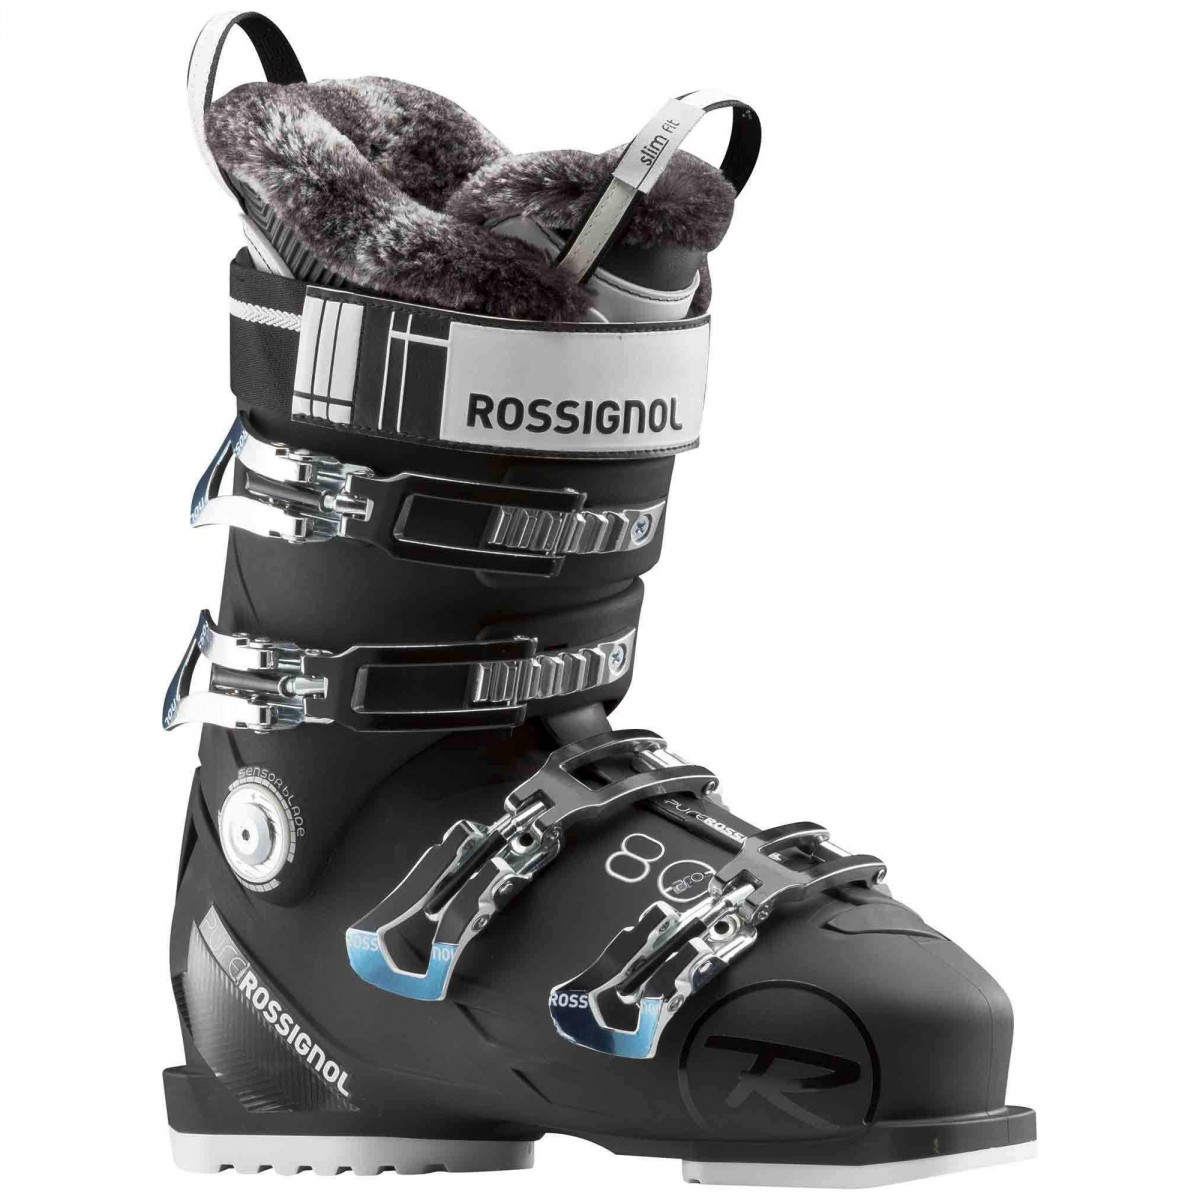 chaussures ski rossignol pure pro 80 chaussures ski femme. Black Bedroom Furniture Sets. Home Design Ideas